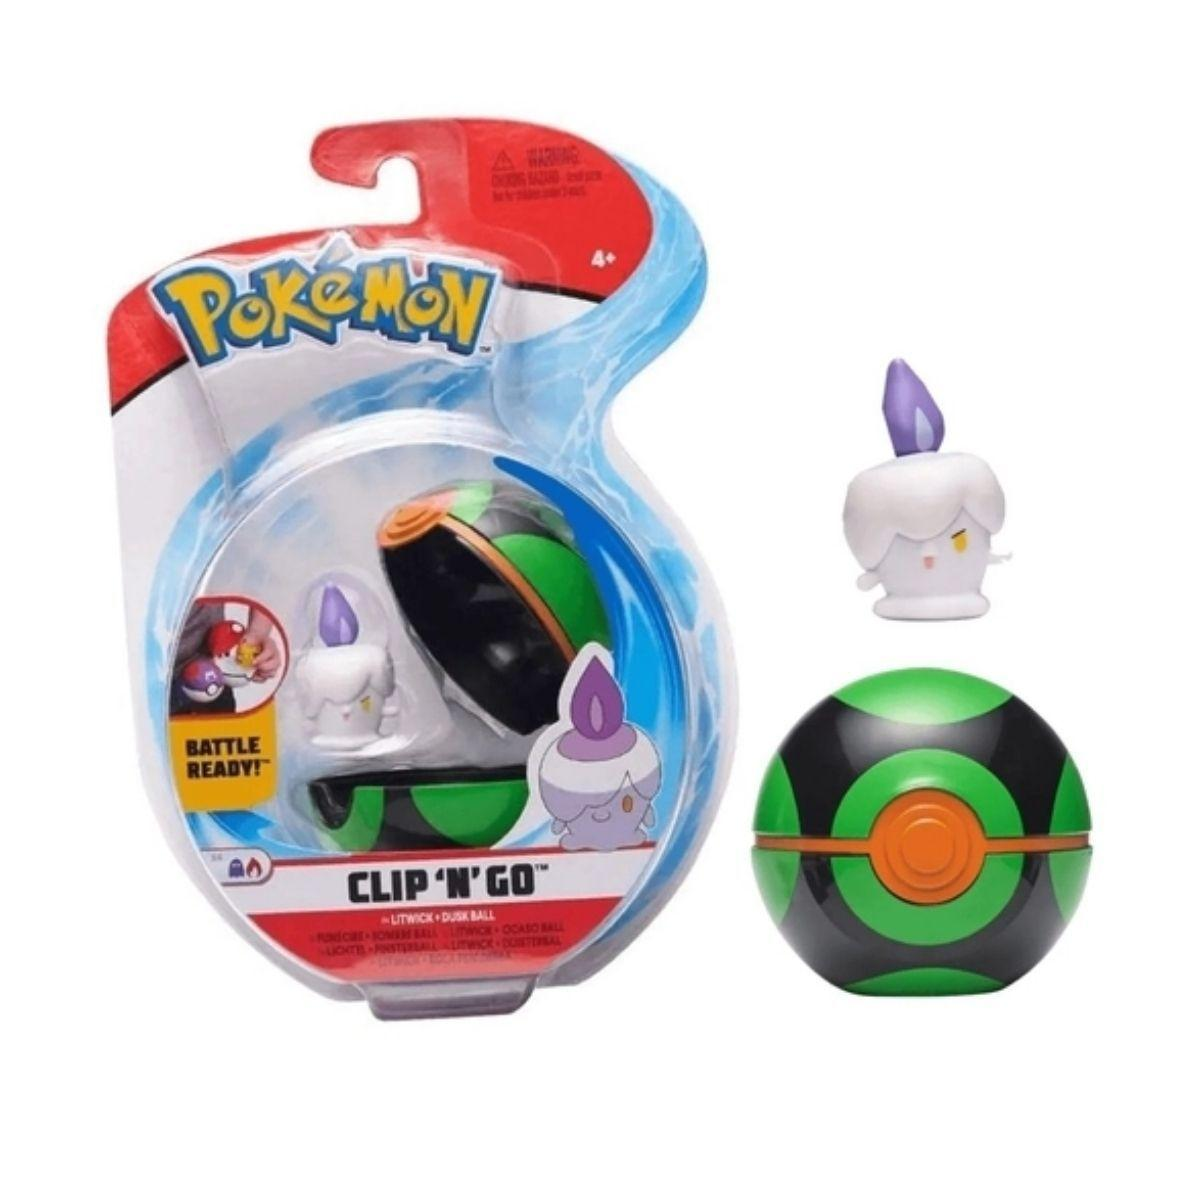 Boneco Litwick e Bola Crepúsculo Dusk Ball: Pokémon (Clip'n'Go) - Sunny